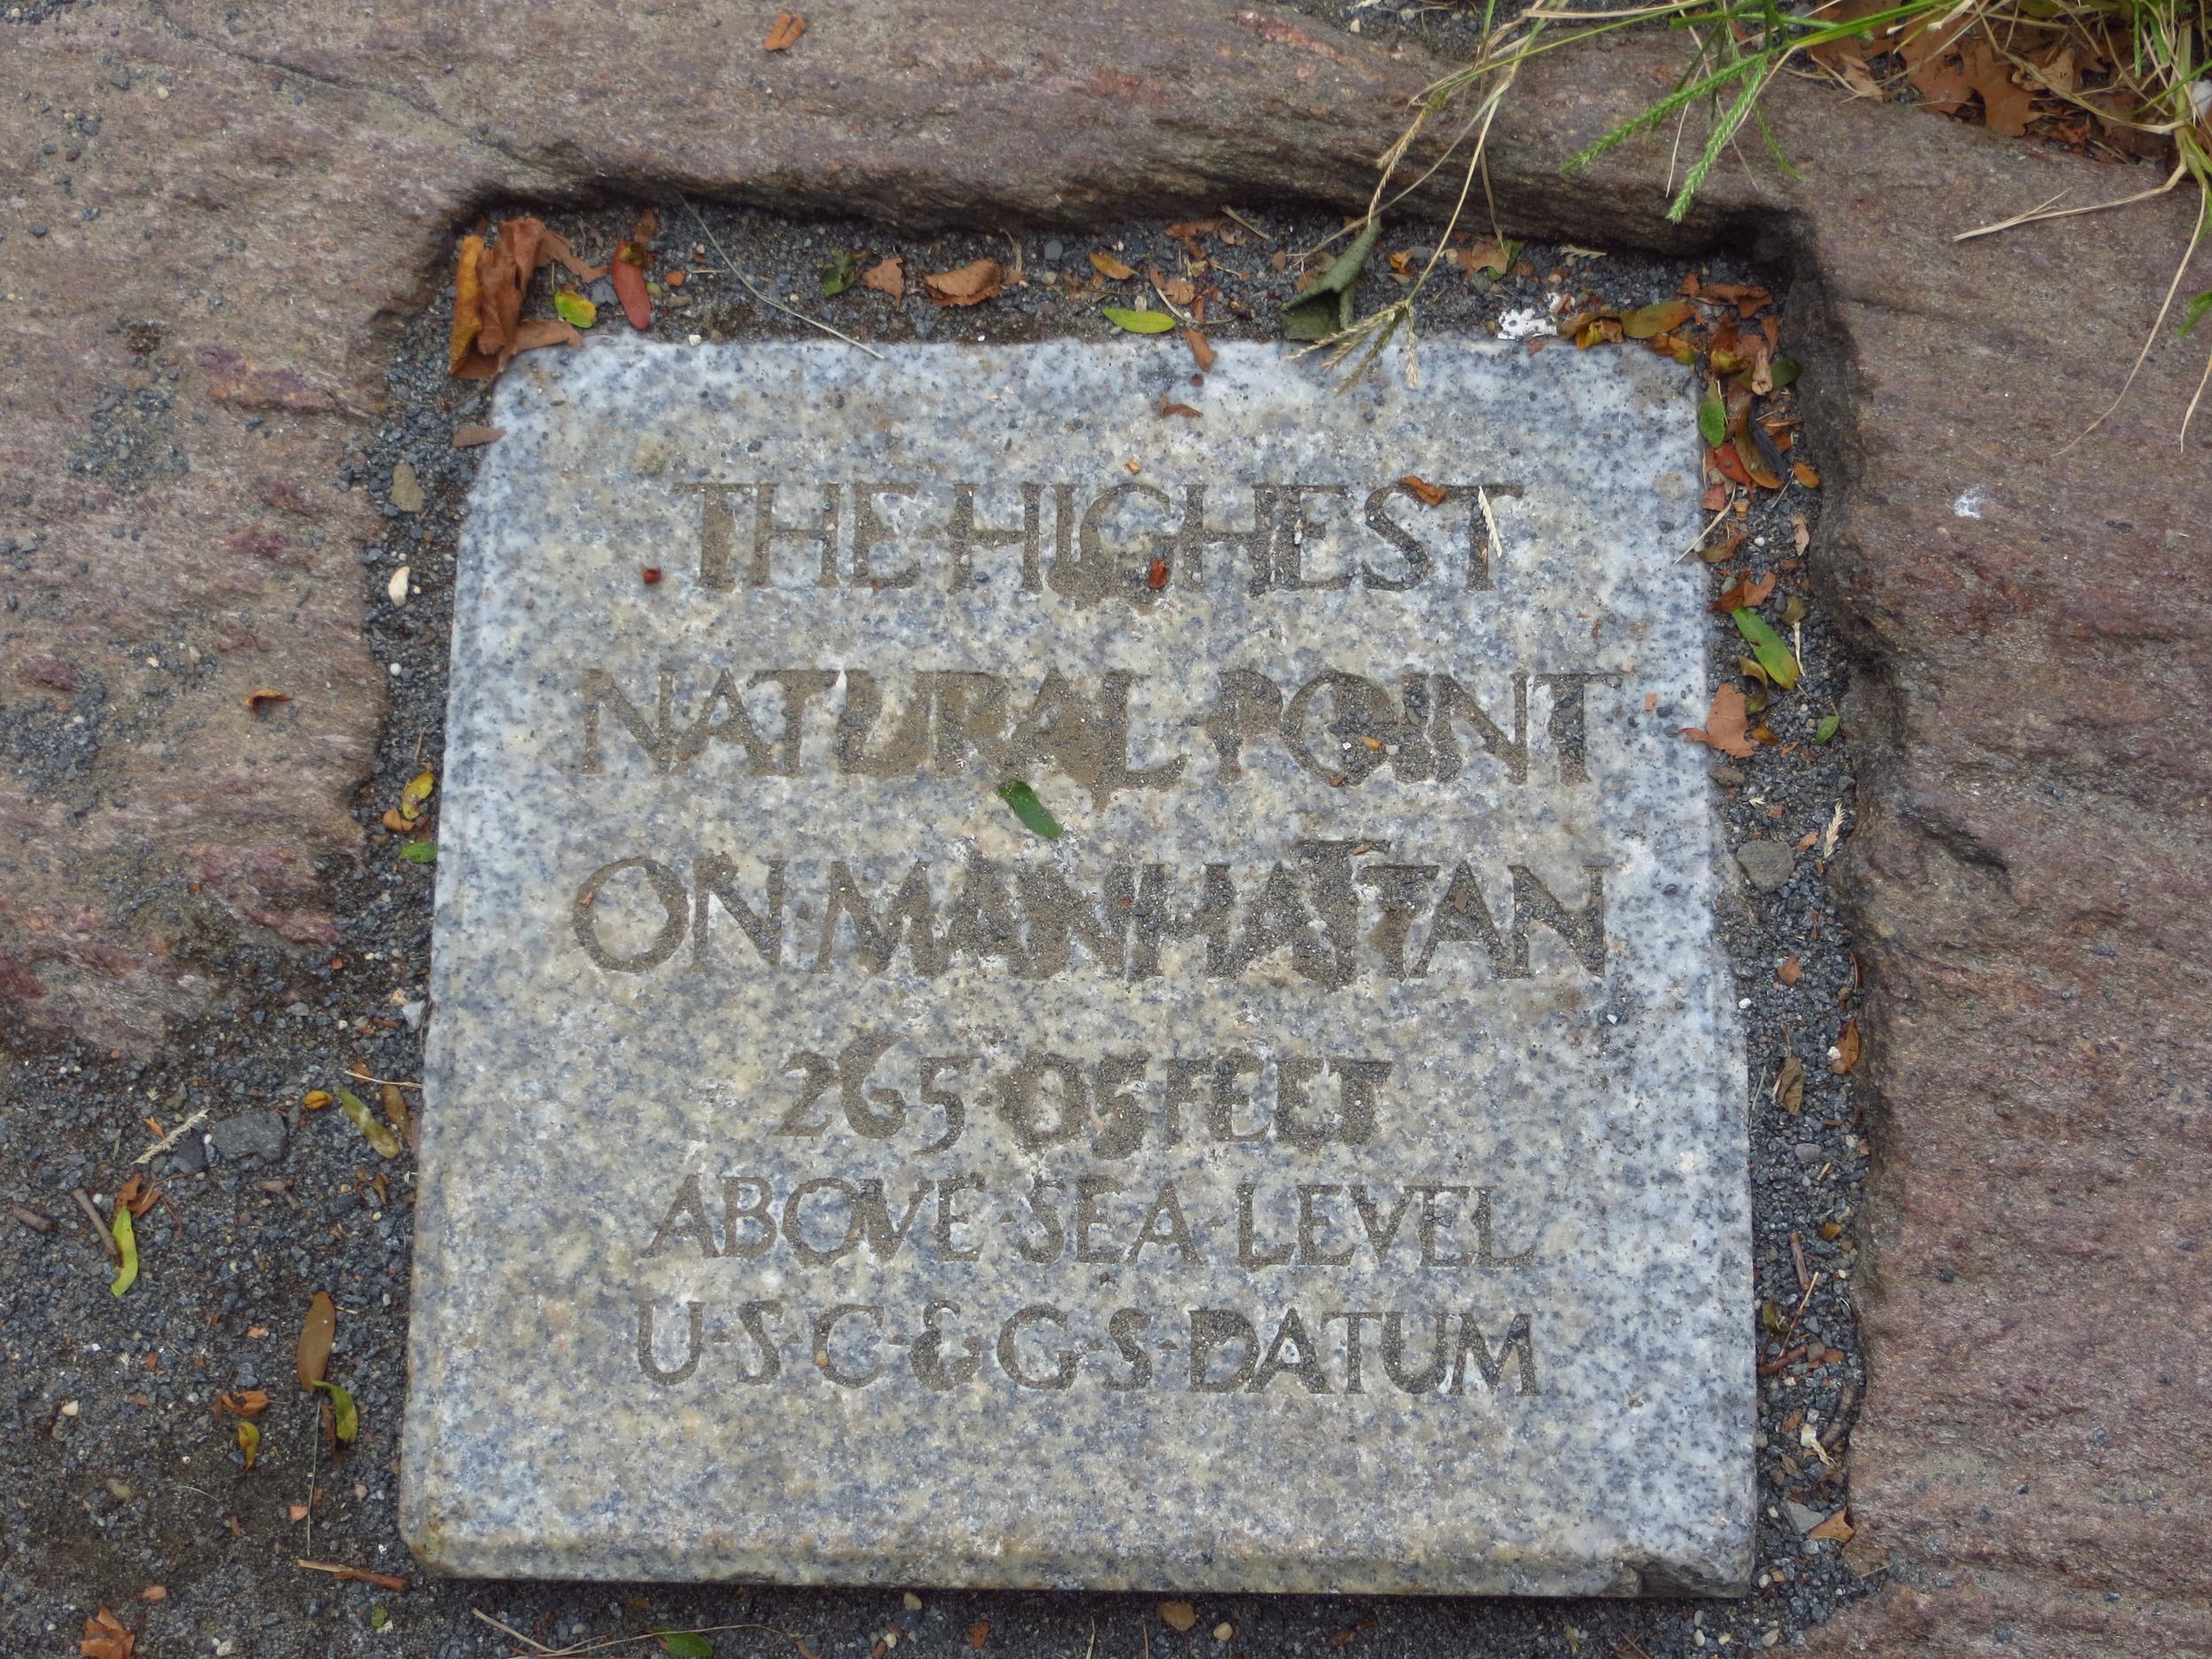 The highest natural point on Manhattan